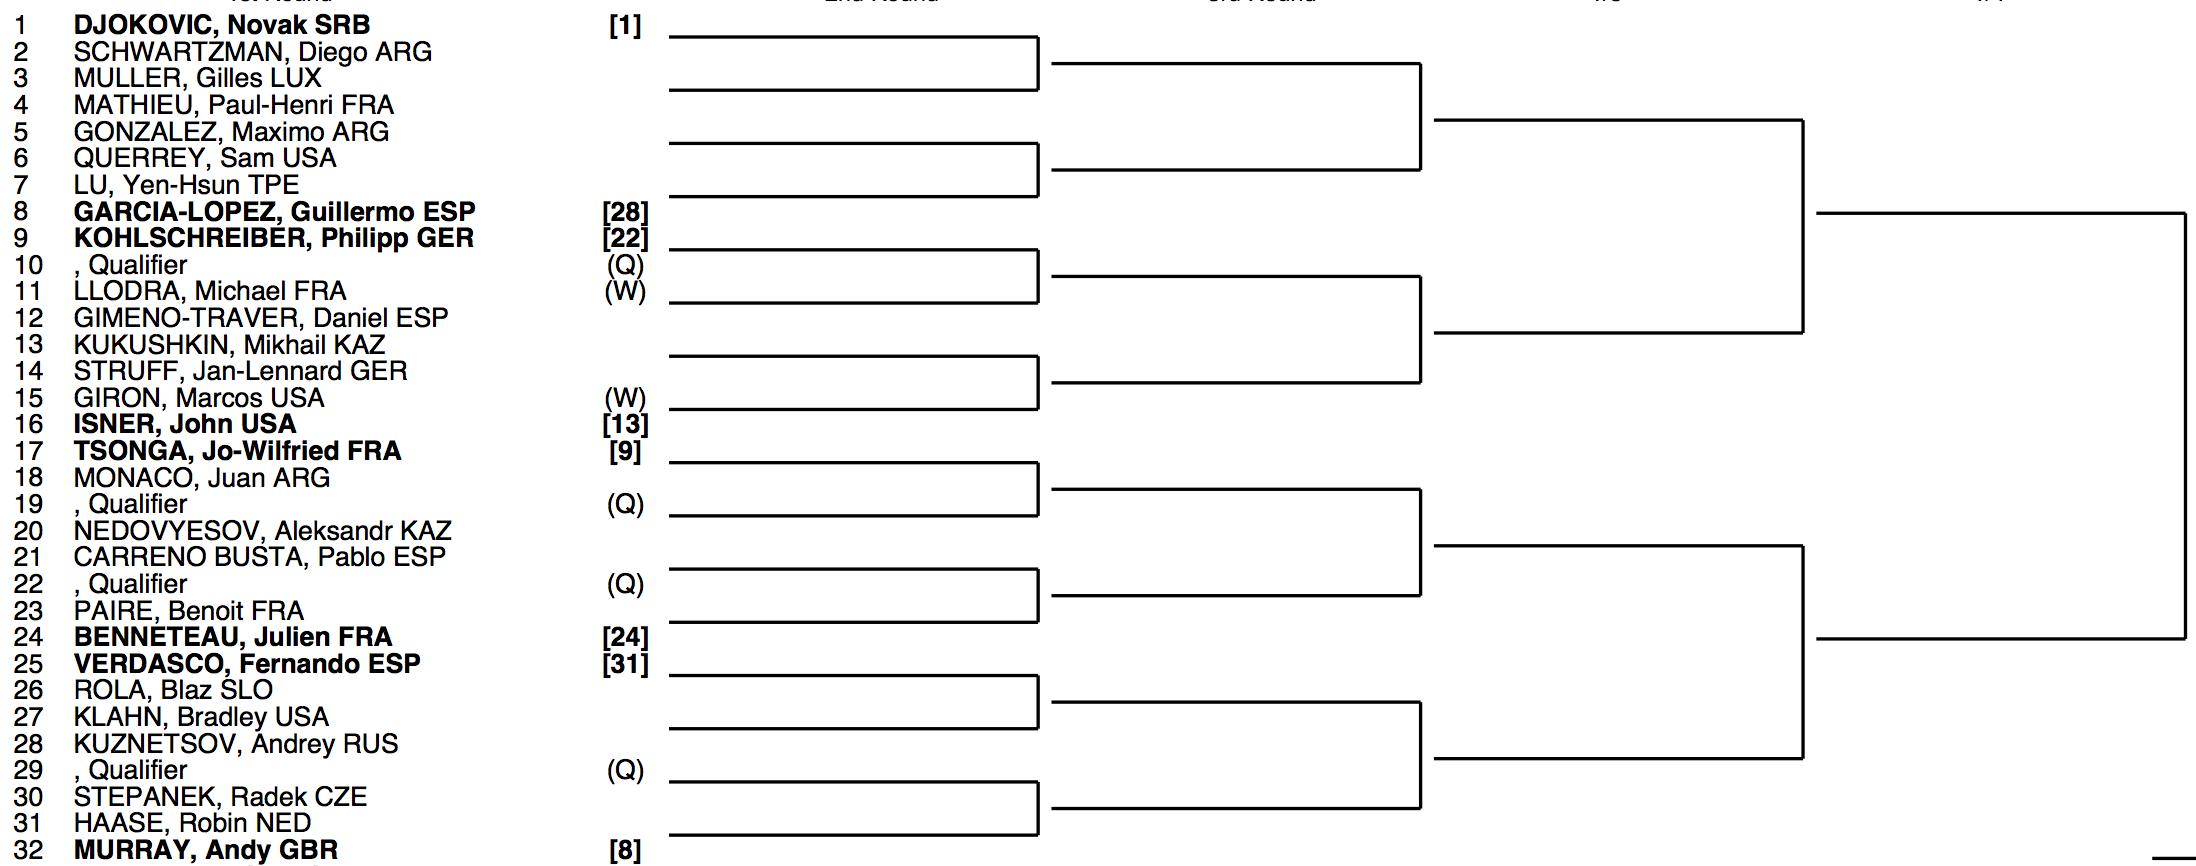 US Open 2014 draw 1:4